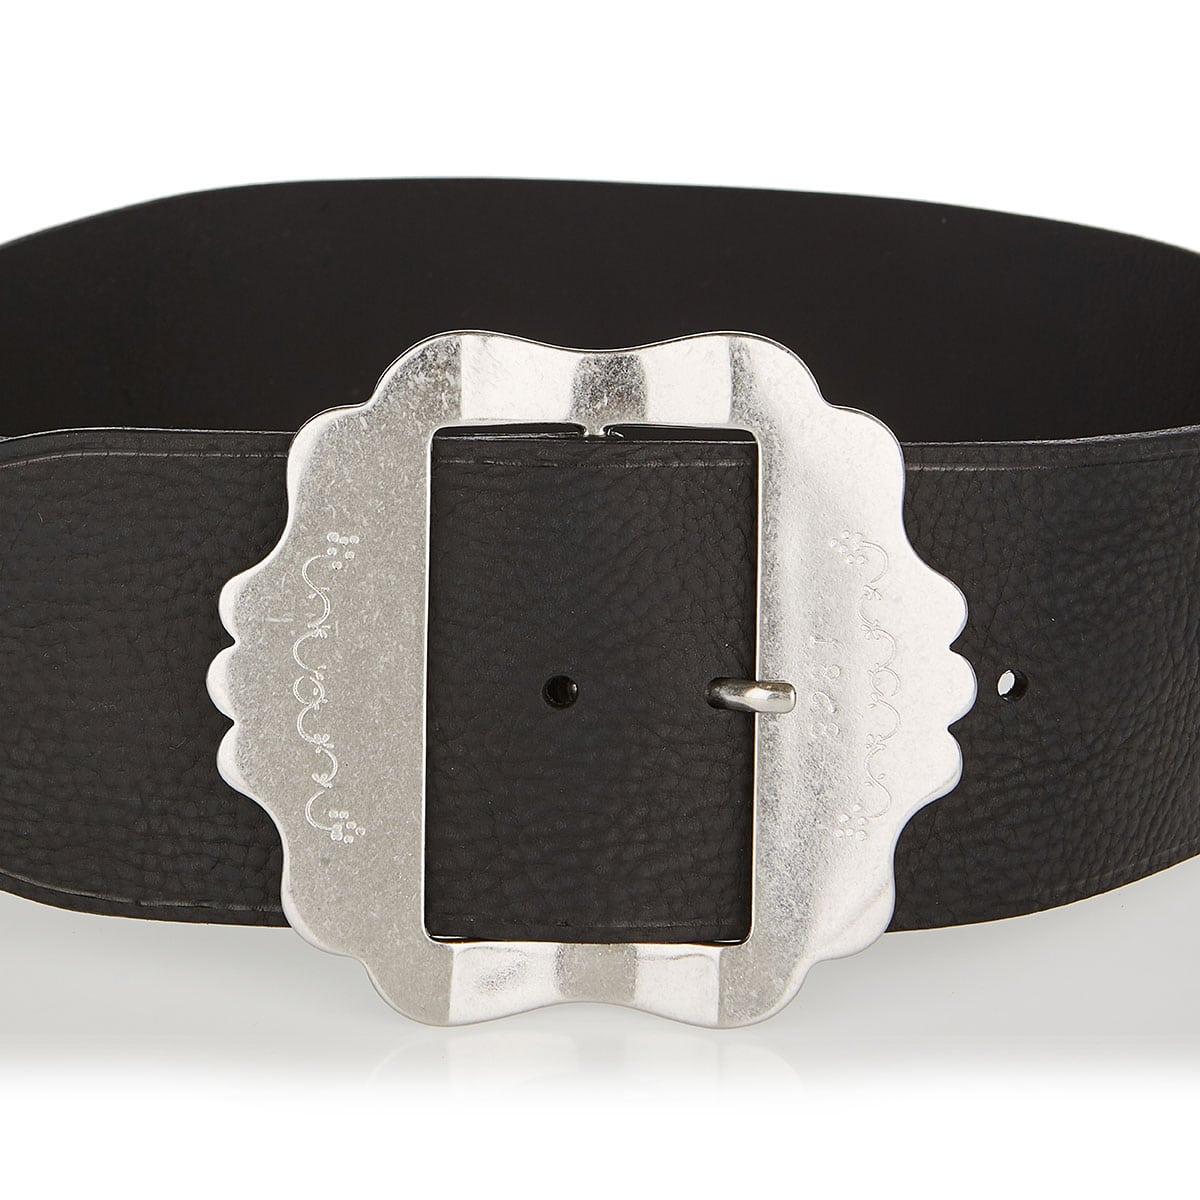 Awele wide leather belt